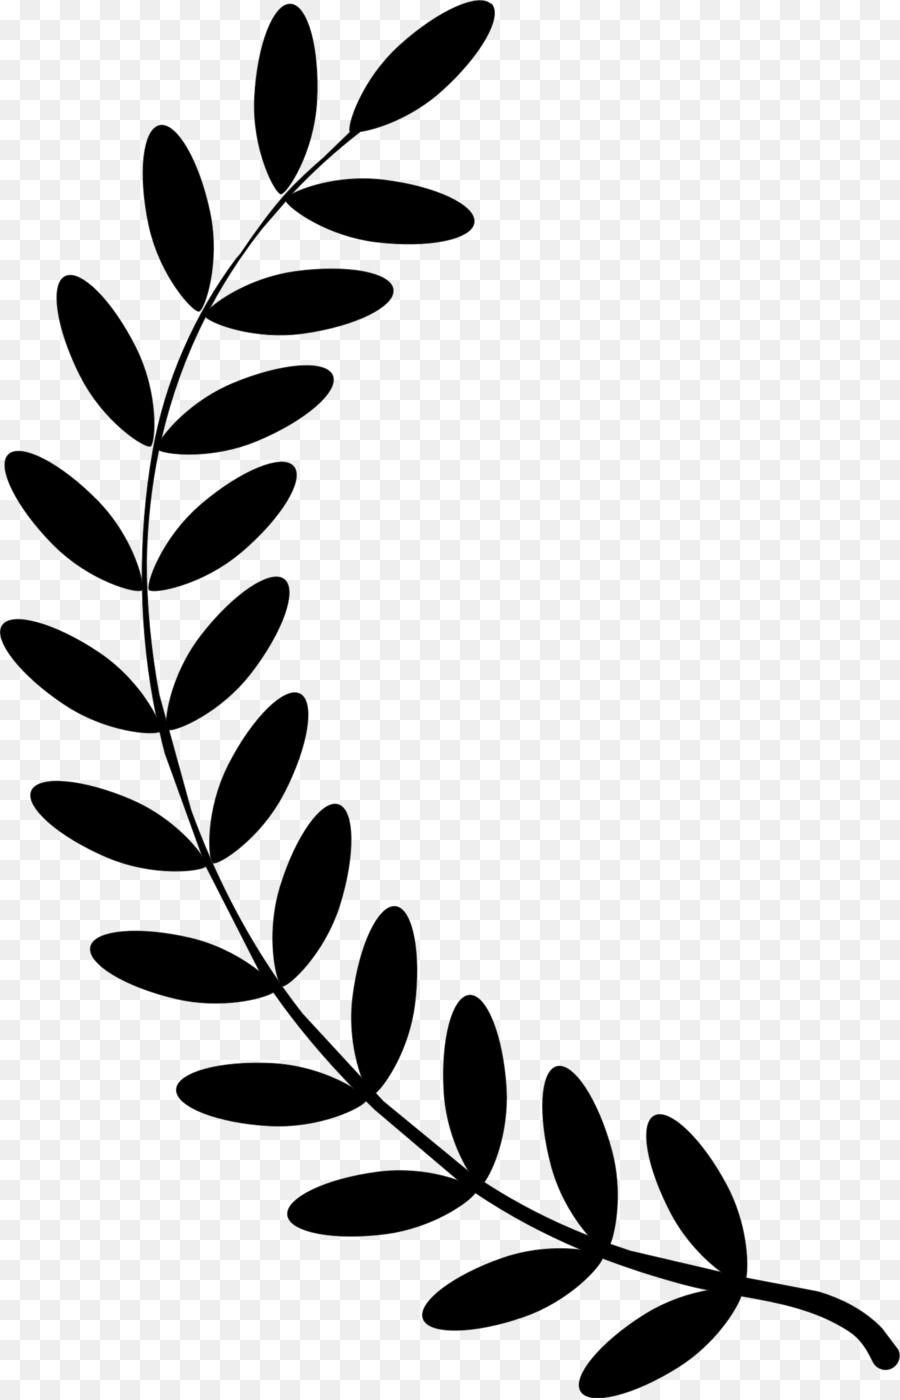 Olive Branch Laurel Wreath Clip Art Laurel Wreath Images Png Is About Is About Plant Flora Leaf Monochrome Pho Wreath Clip Art Laurel Wreath Cricut Crafts